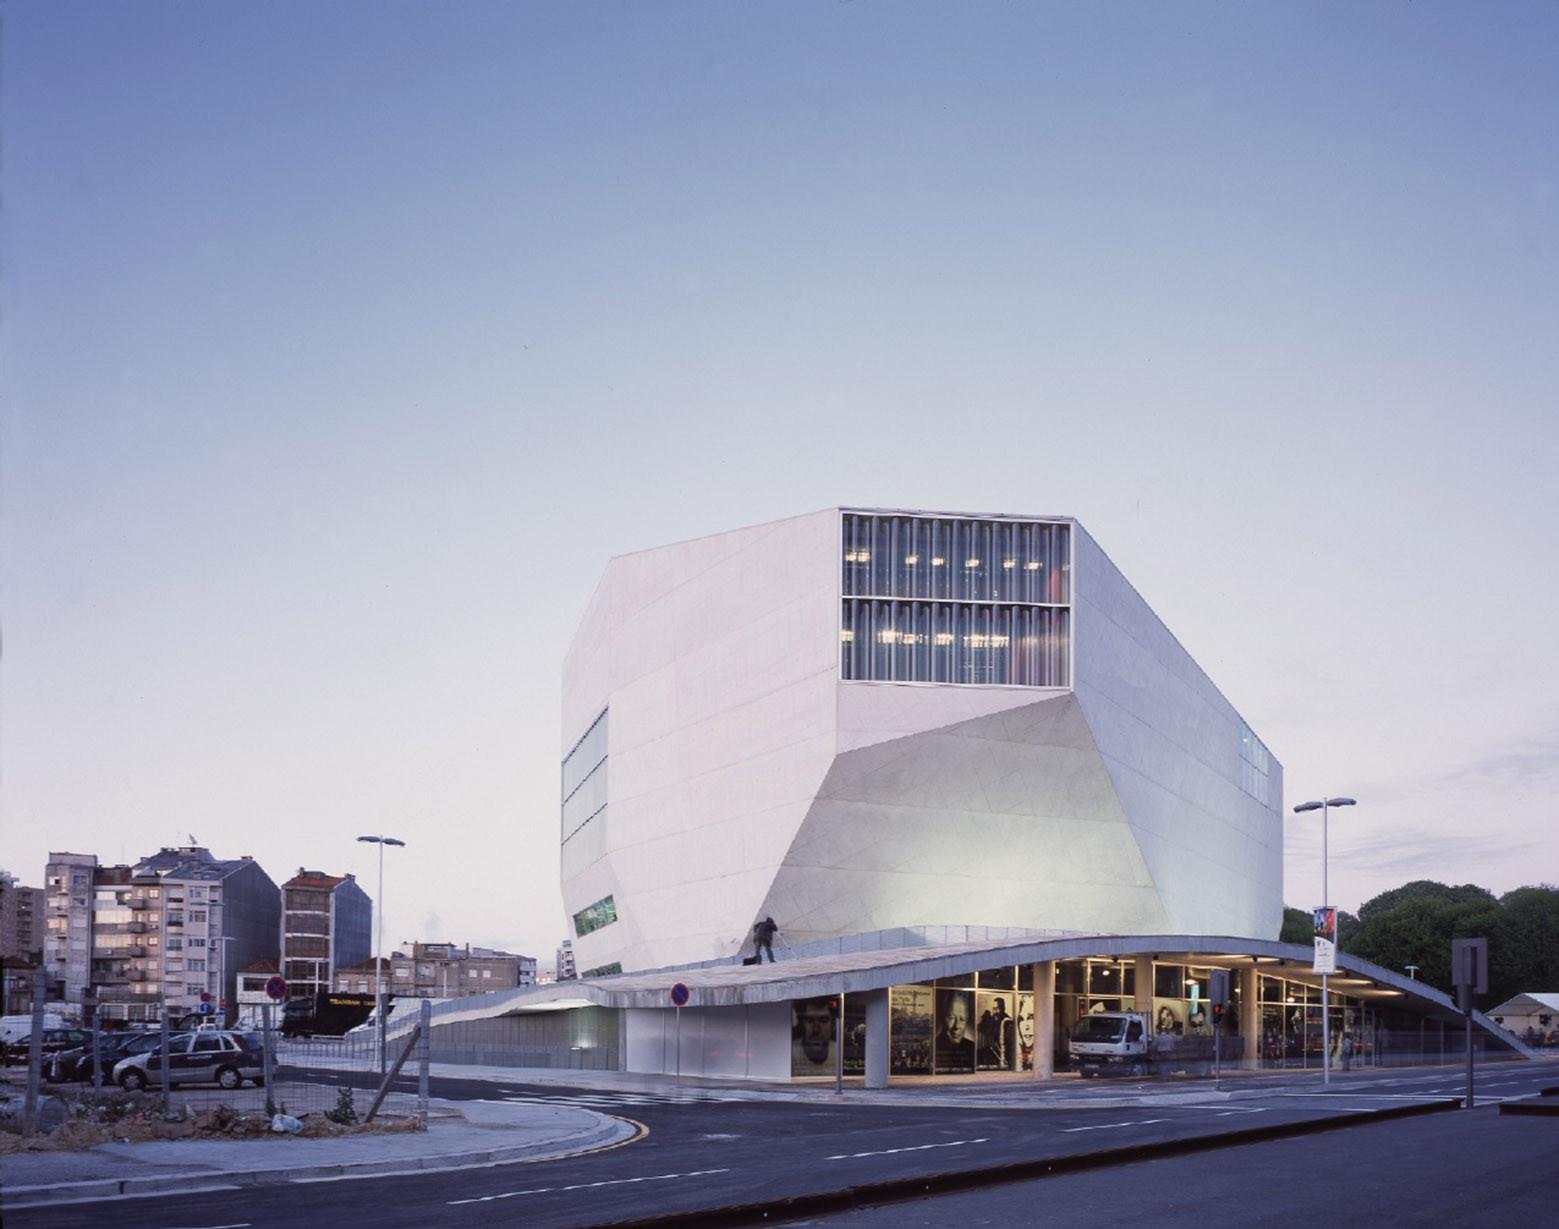 Casa da musica oma archdaily for Archdaily com